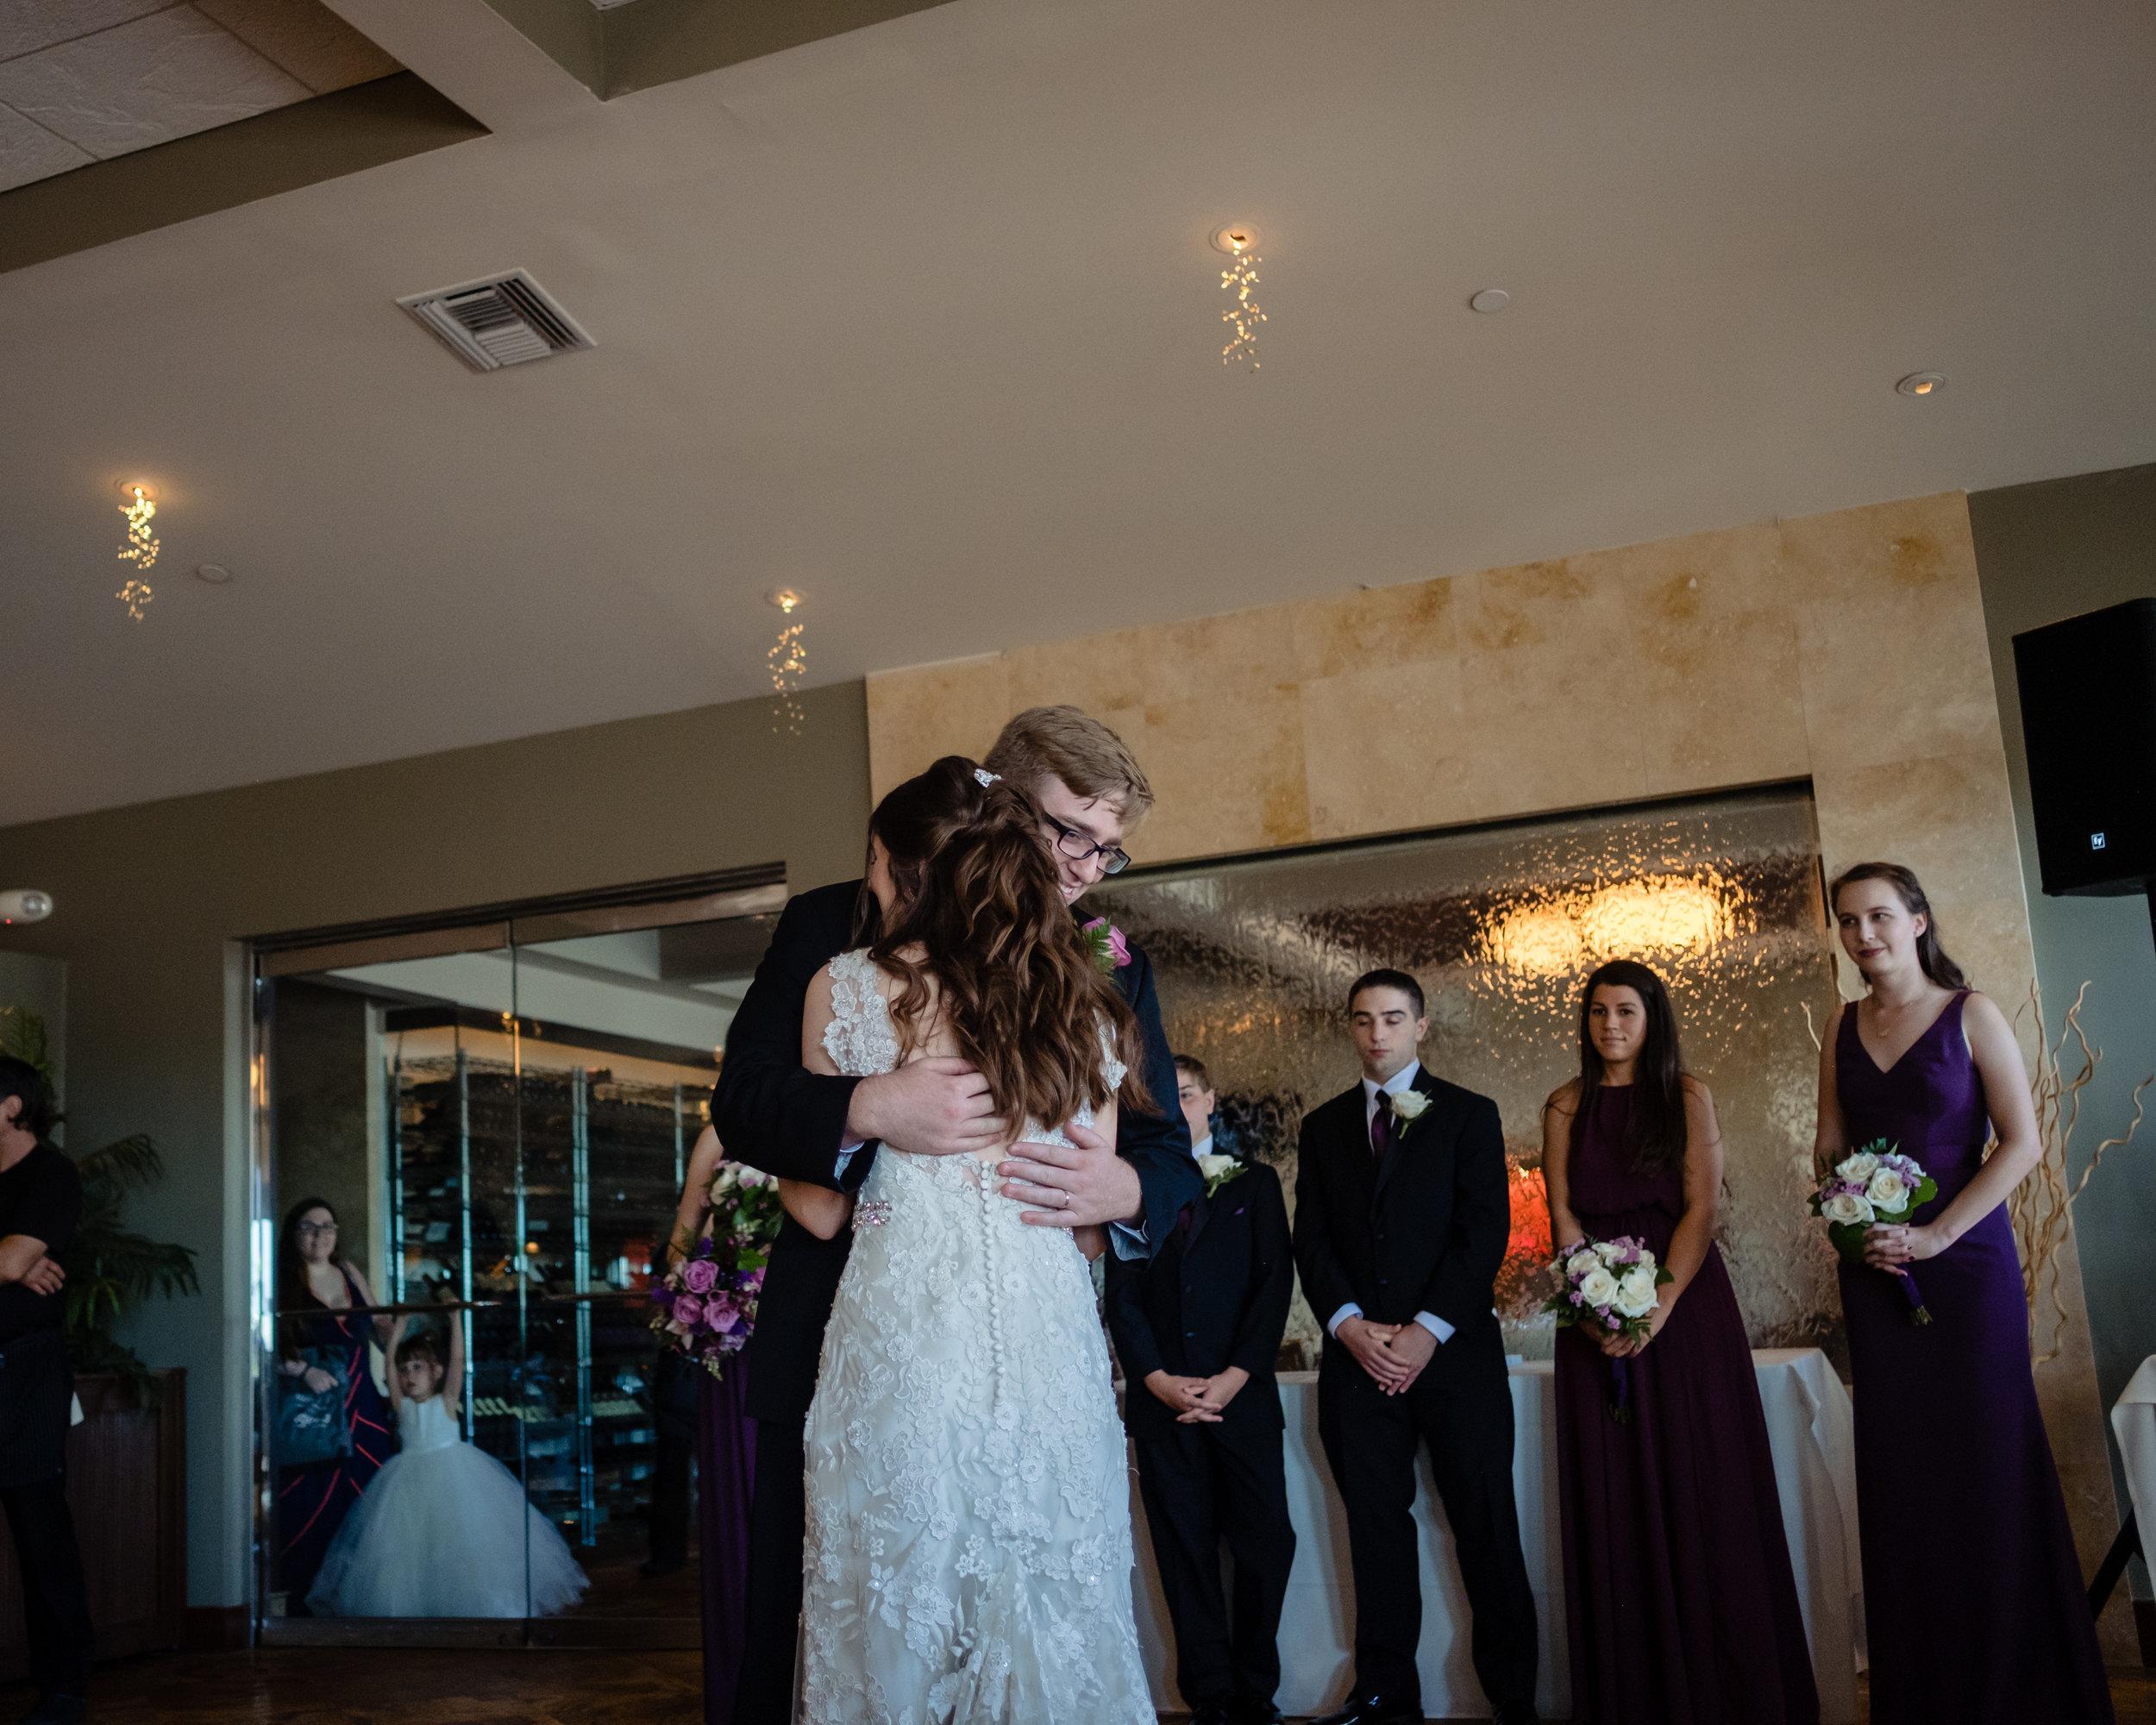 HAH_Zoe and Daniel_Clearwater Wedding_399_2018.jpg